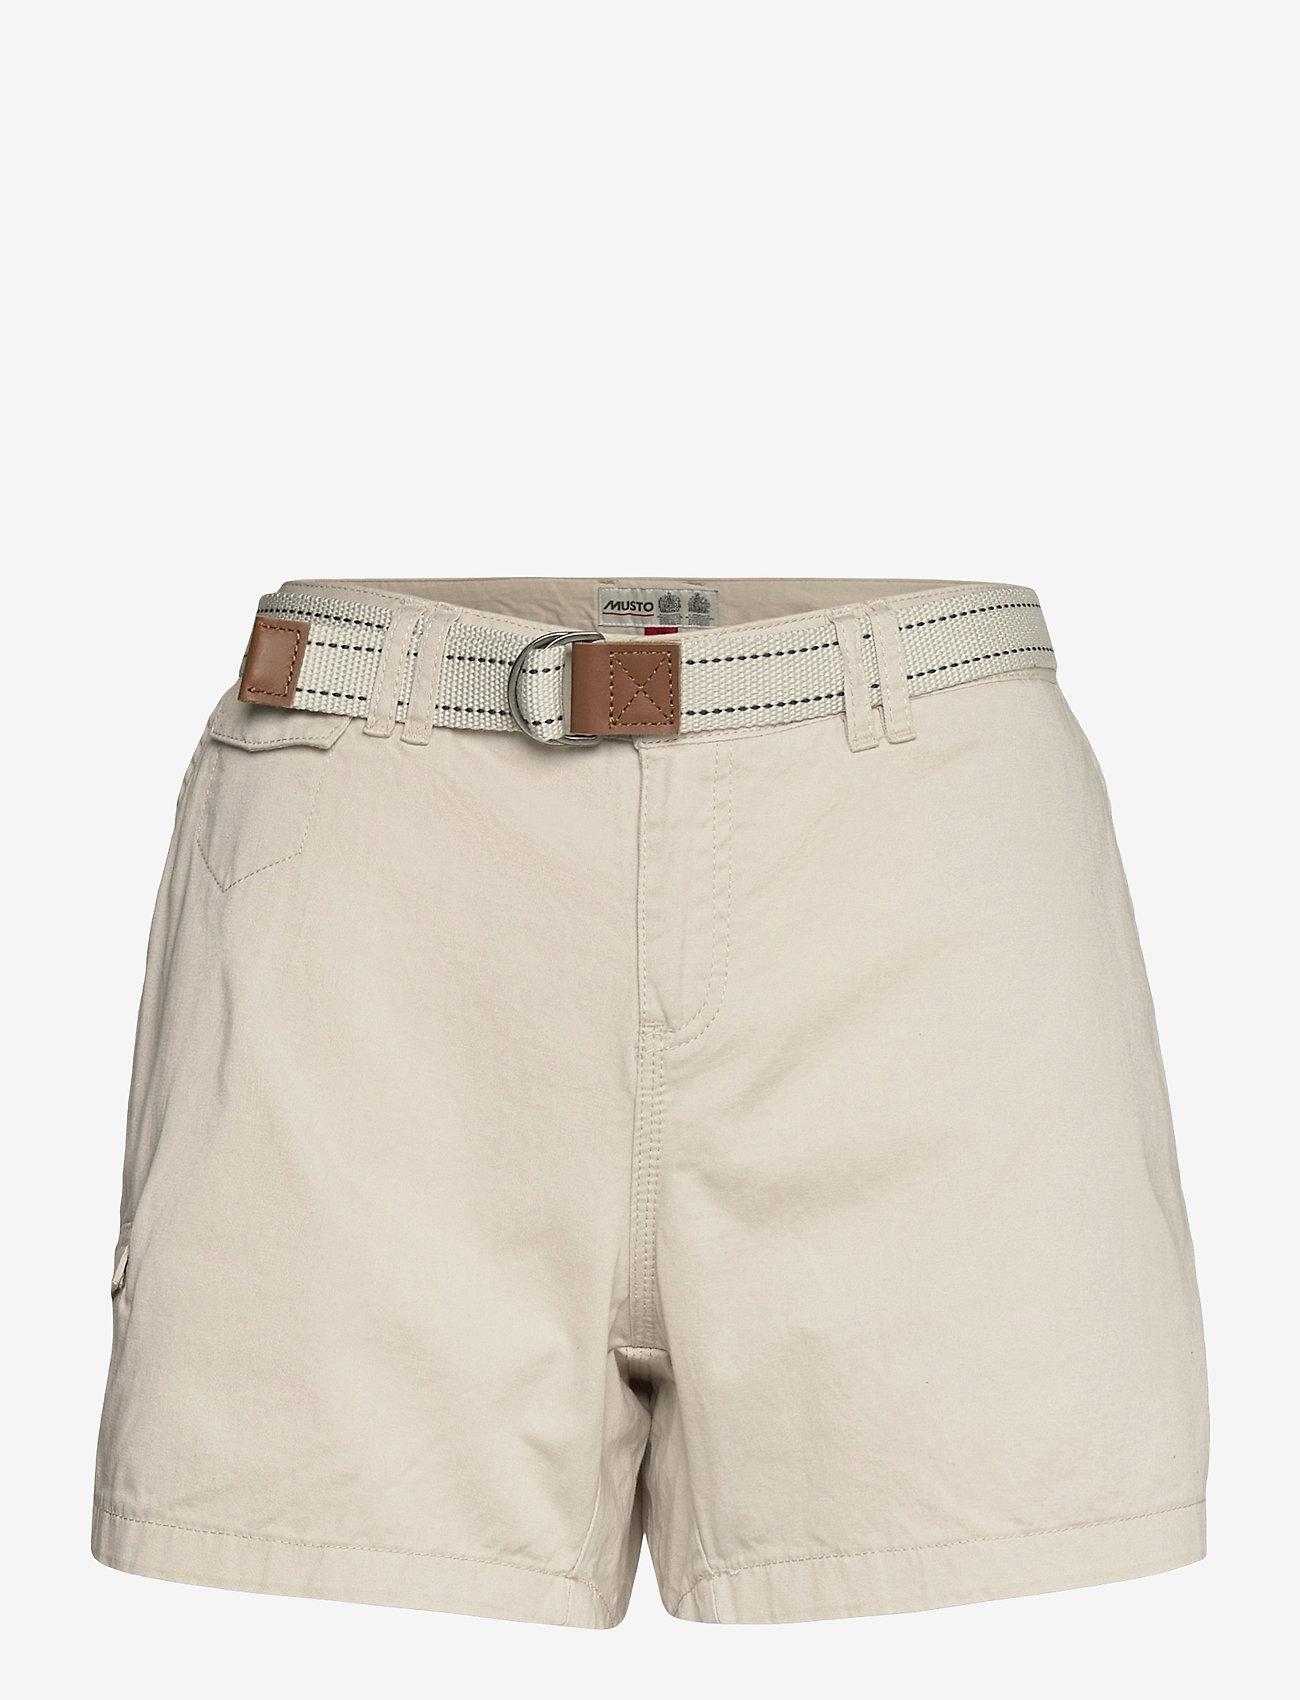 Musto - TACK COTTON SHORT FW - chino shorts - white sand - 0